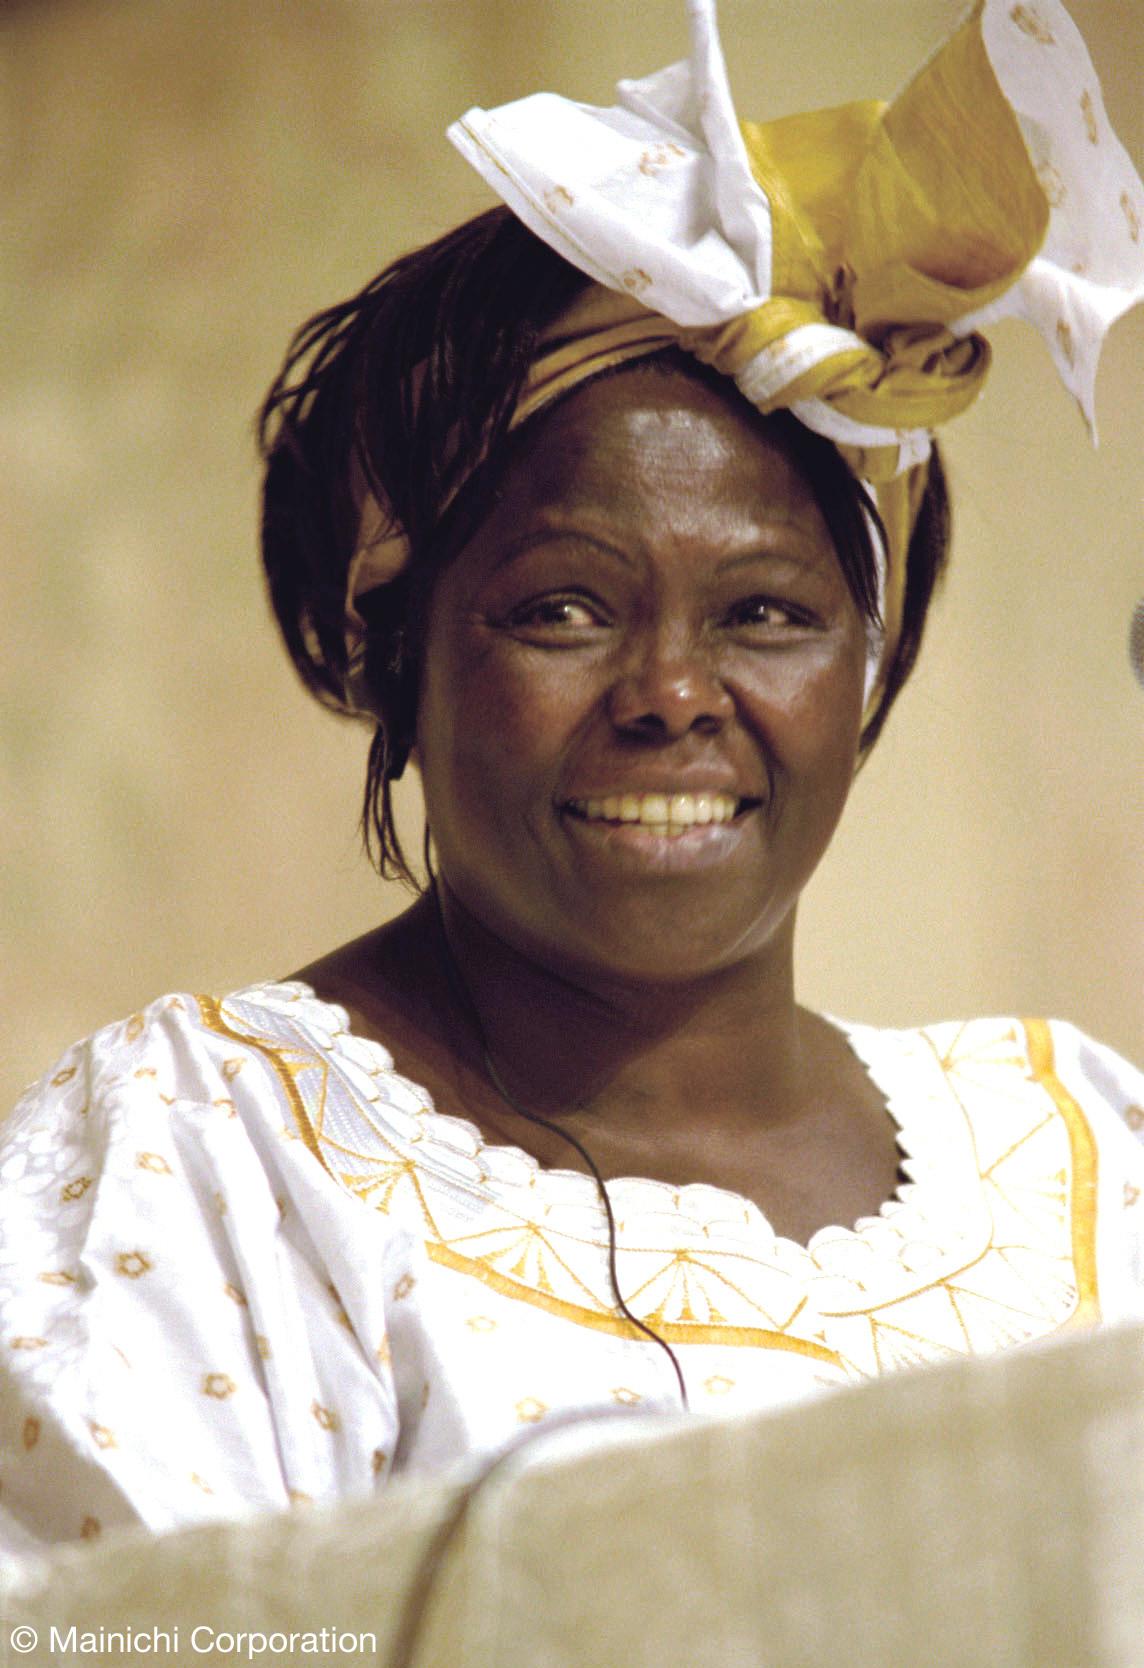 Mother of Trees – Wangari Maathai